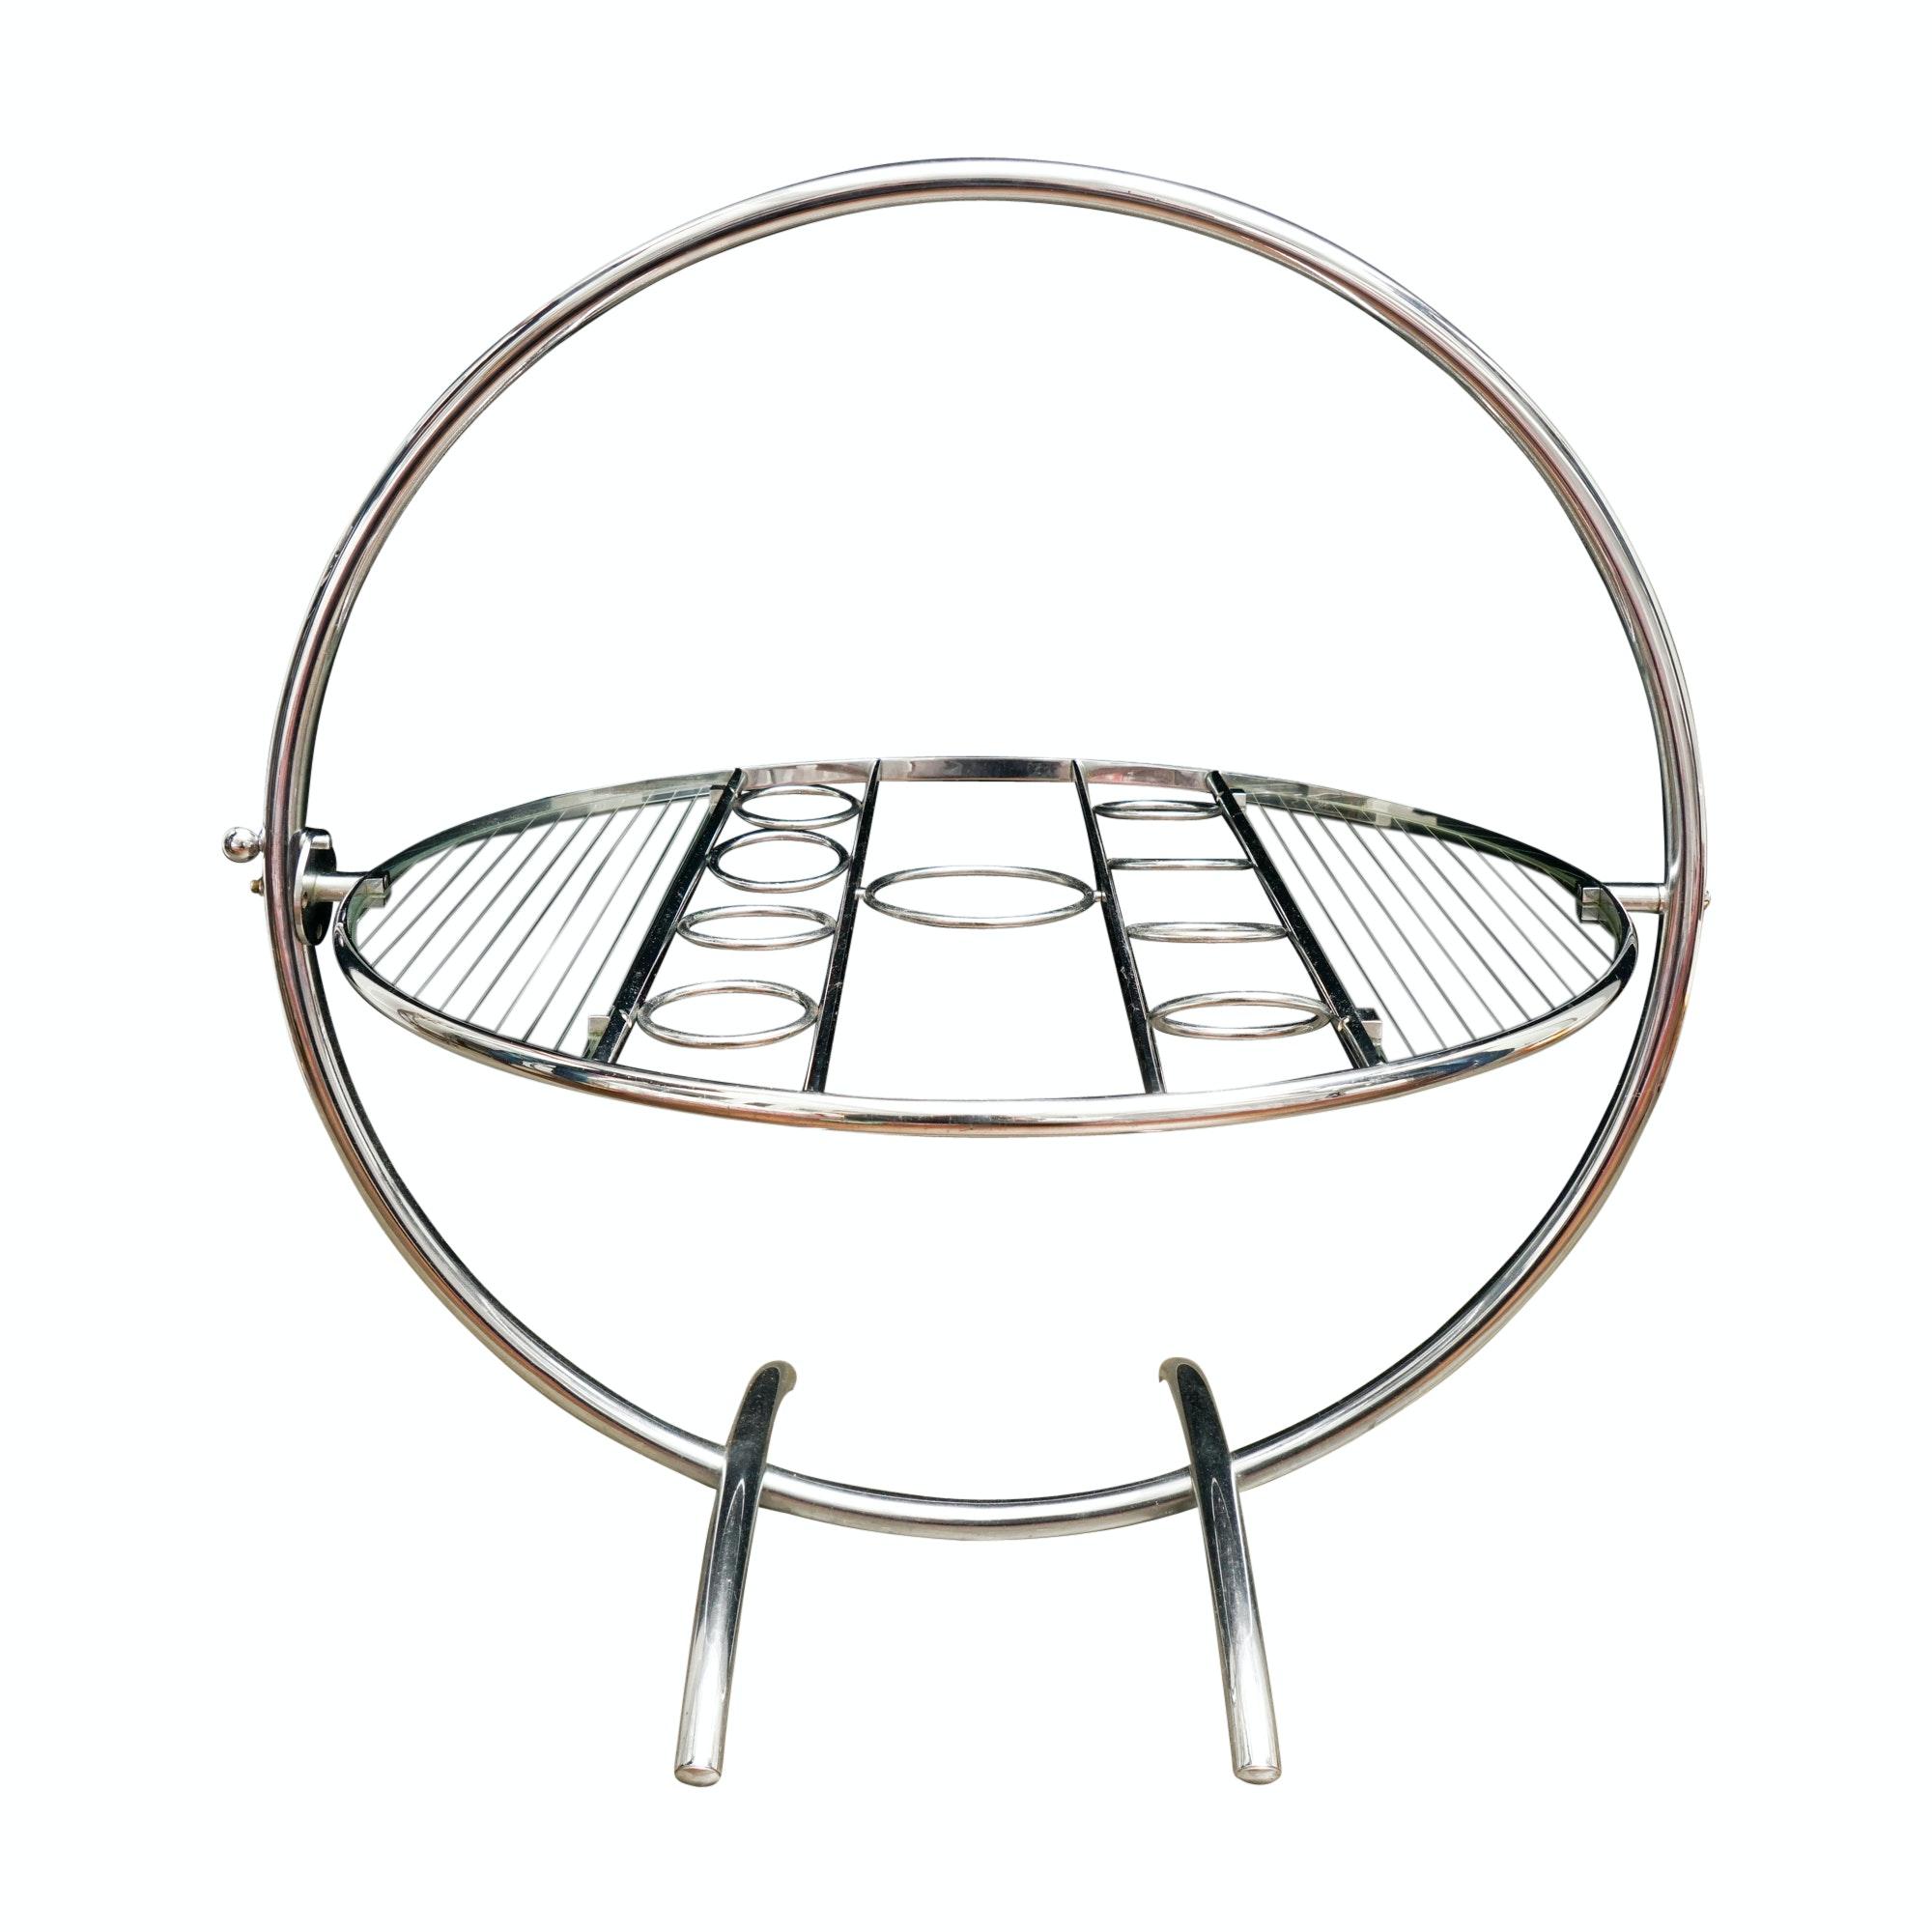 Art Deco Chromed Metal Tilt-Top Cocktail Table